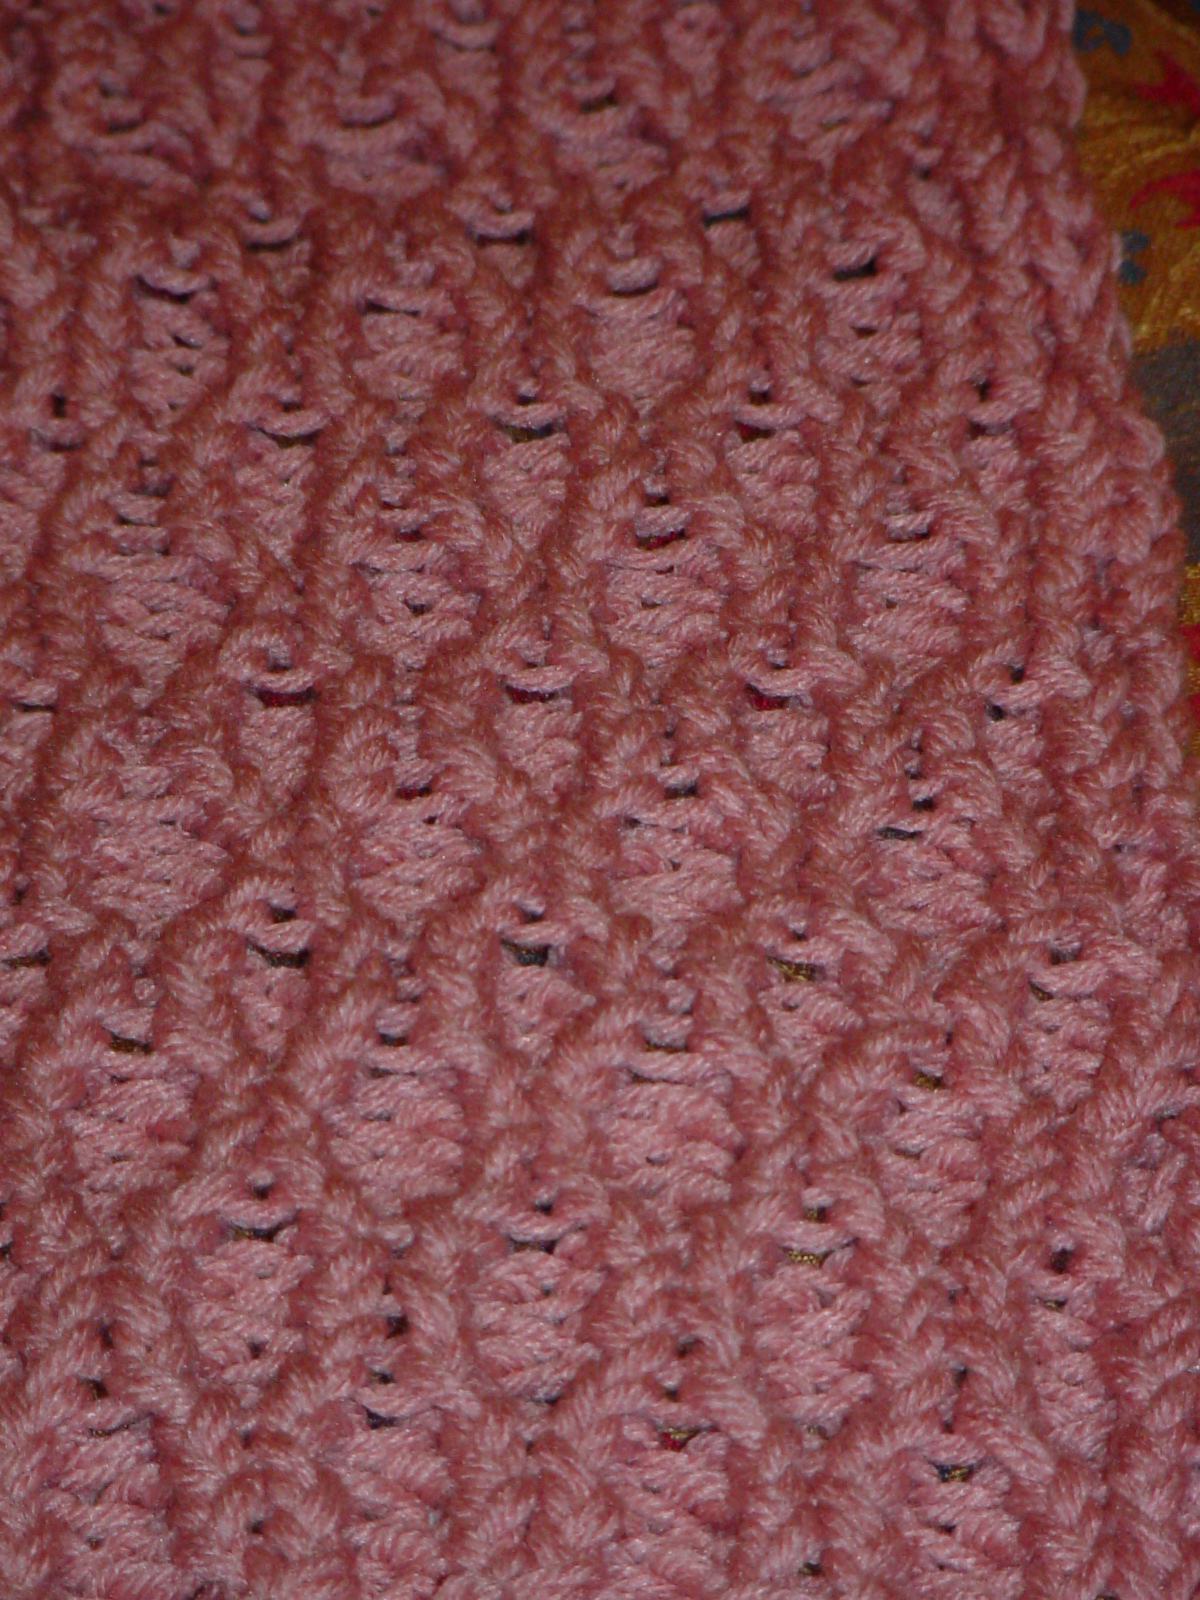 Honeycomb Knitting Stitch How To : The Knifty Knitter: The Latest Knifty Knitter Project - Honeycomb Stitch Scarf